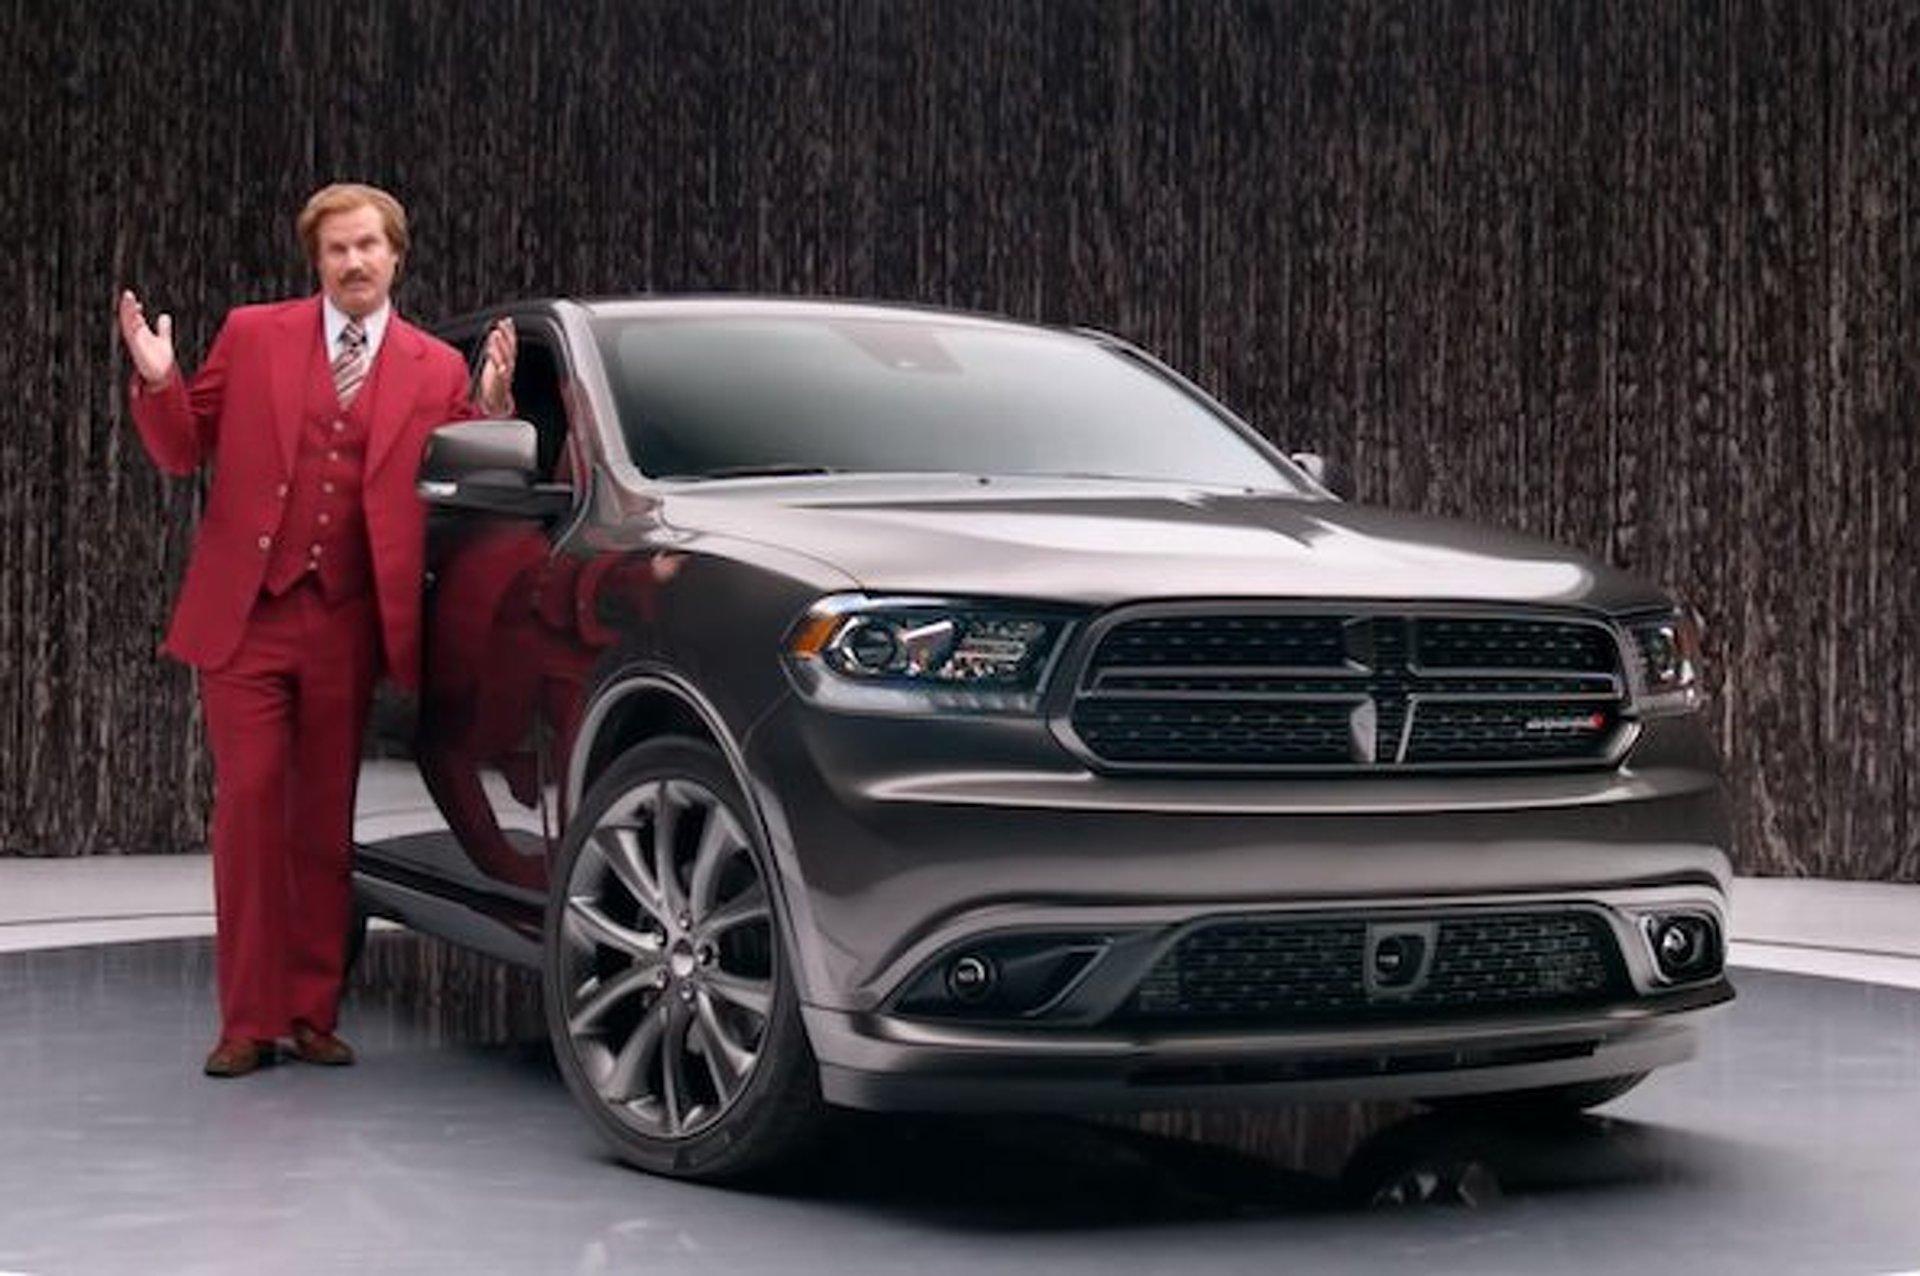 Ron Burgundy Dodge Durango Ads Viewed 2.7M Times [w/video]